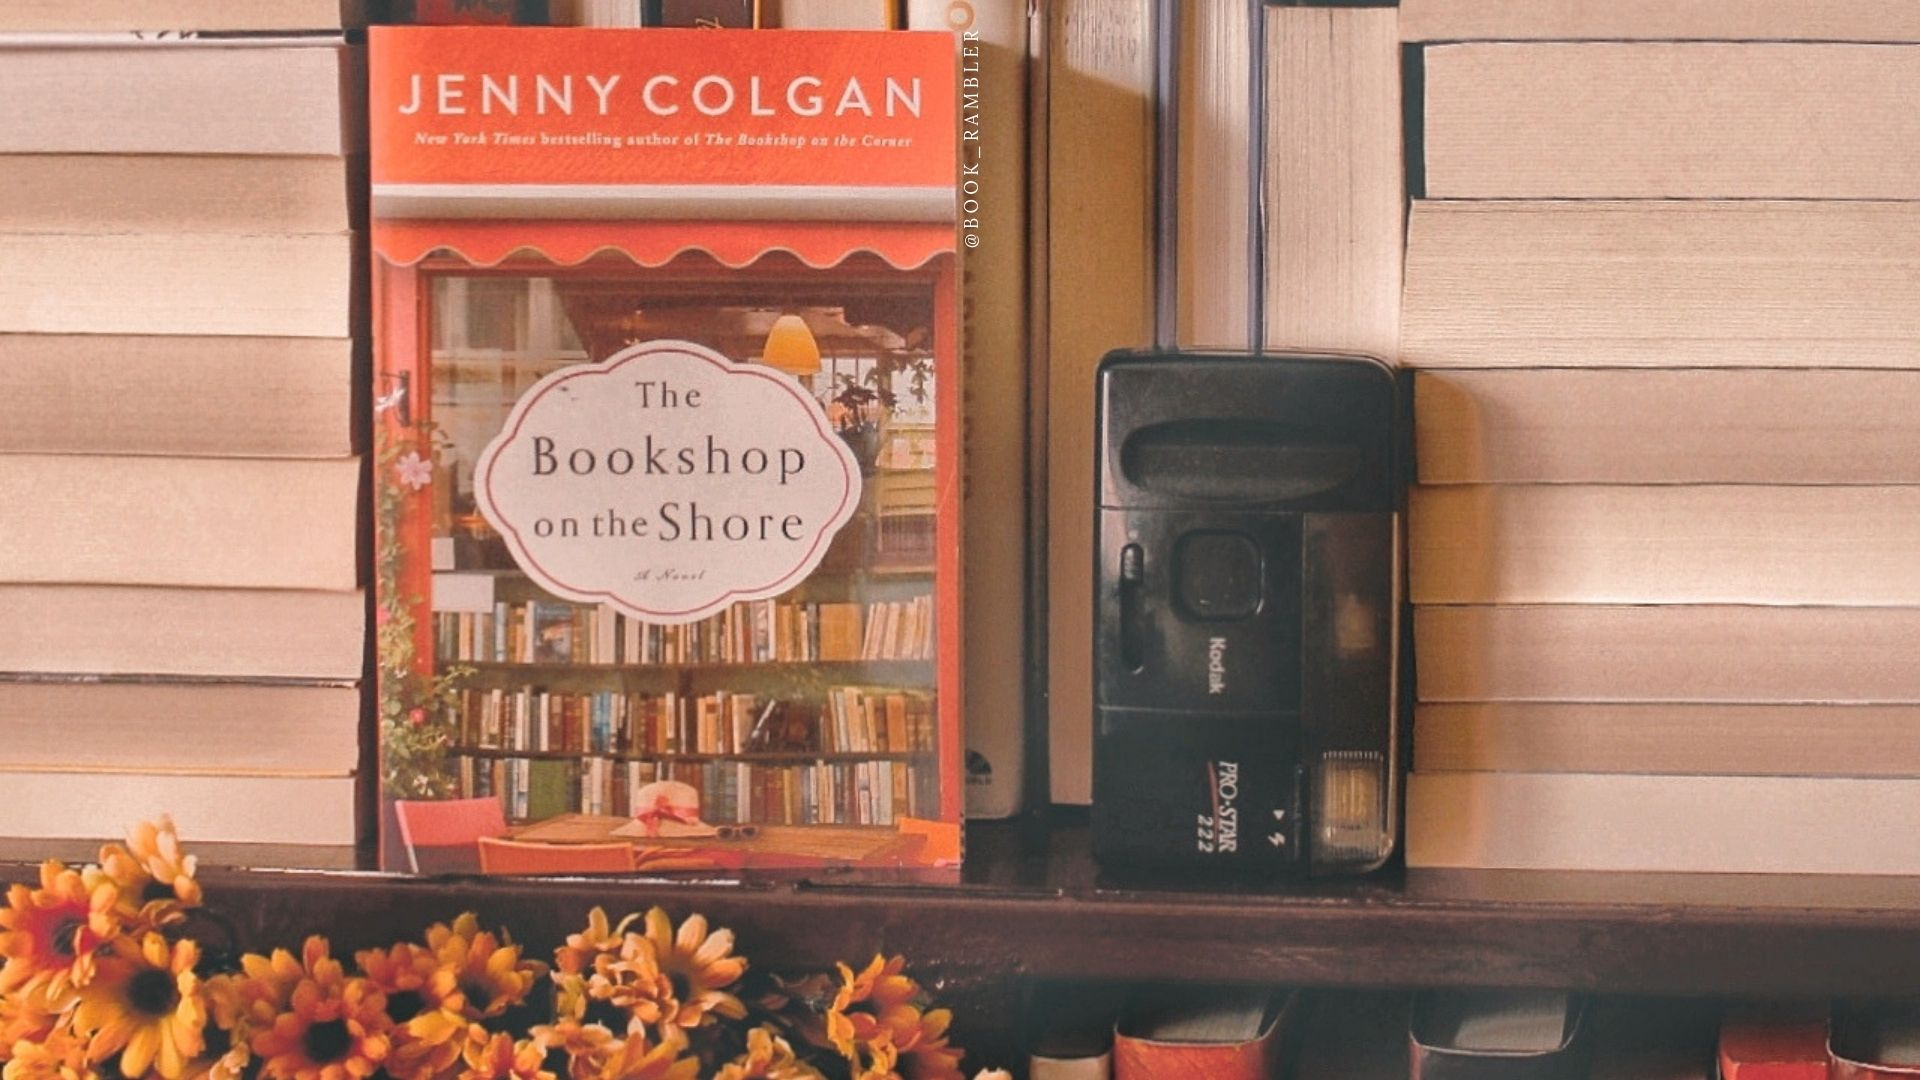 Review: The Bookshop on the Shore(Scottish Bookshop #2), written by Jenny Colgan